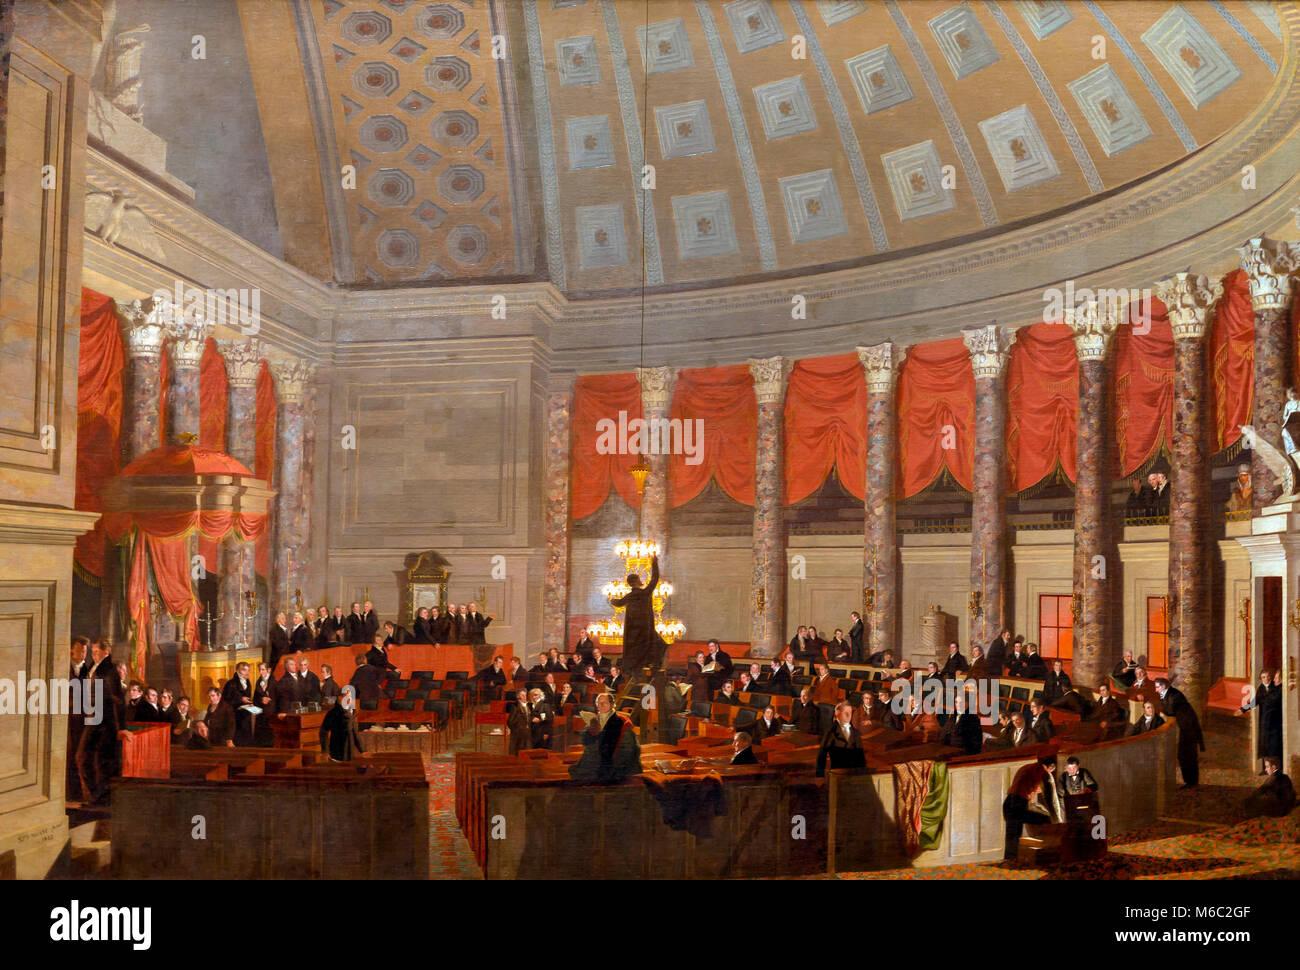 The House of Representatives, Samuel Finley Breese Morse, 1822, National Gallery of Art, Washington DC, USA, North - Stock Image